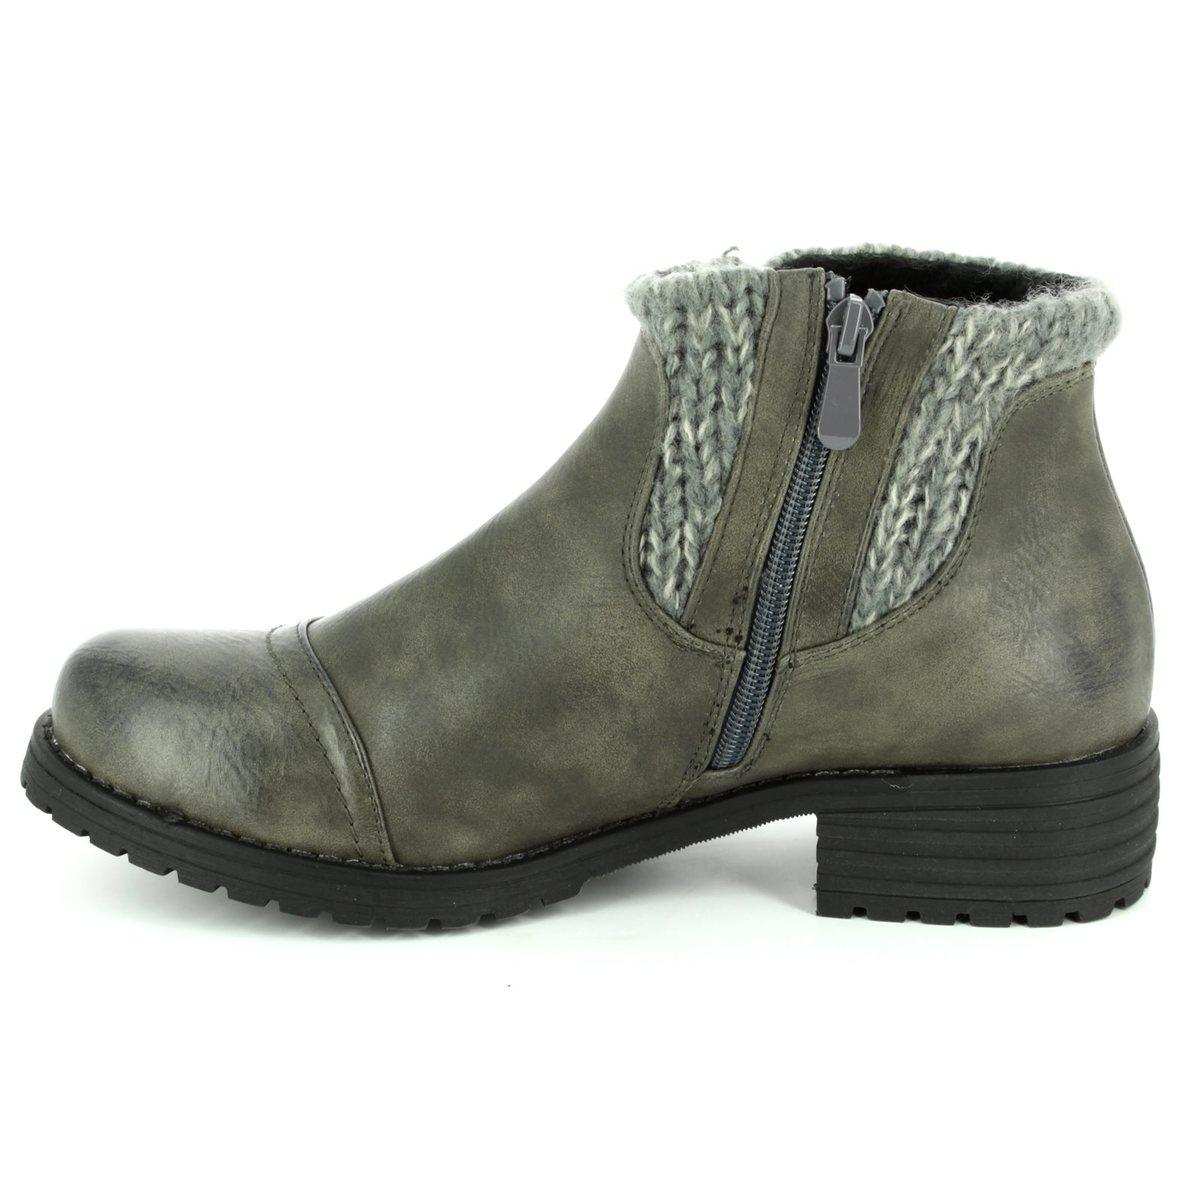 caec98ecc Lotus Ankle Boots - Grey - 40425/00 AYLA